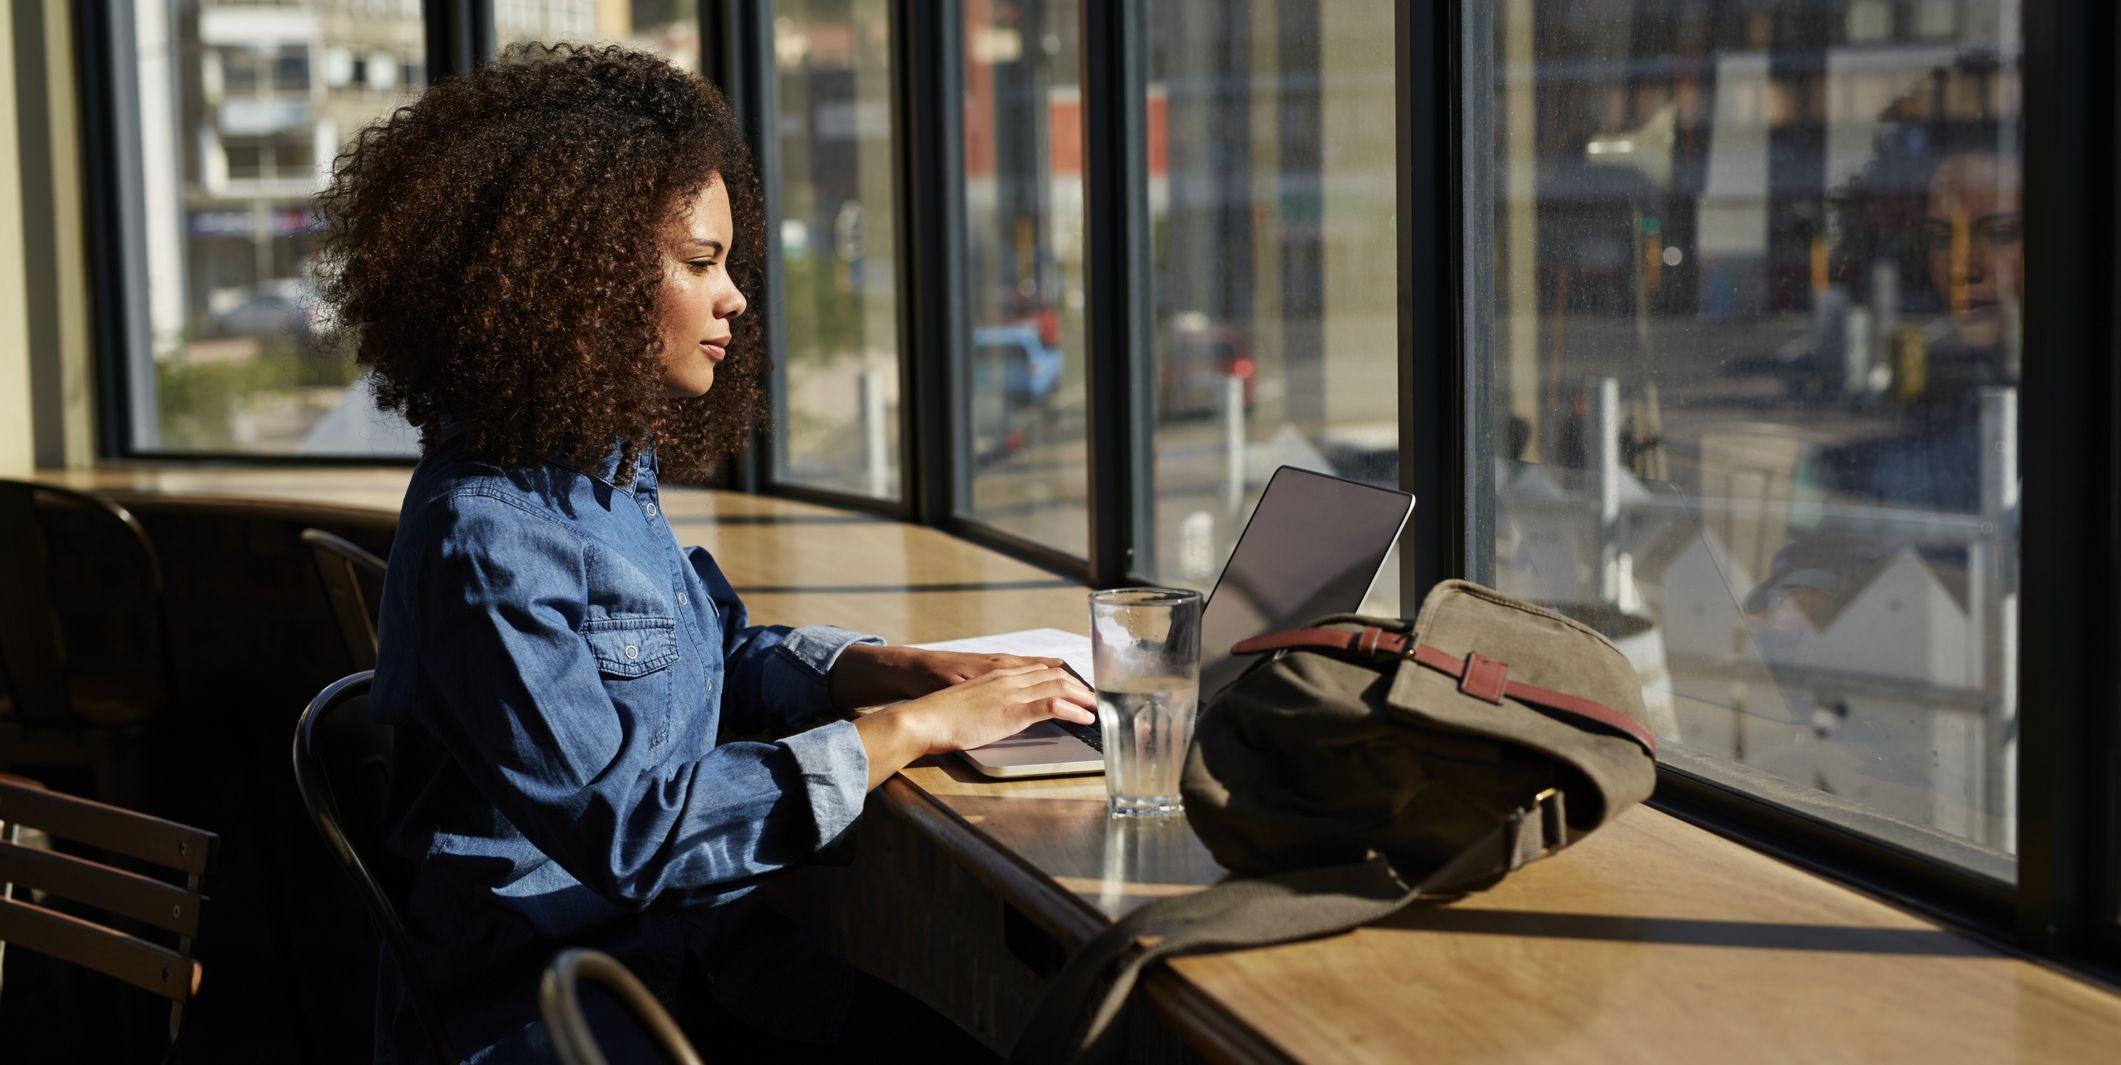 Woman using laptop at cafe at sunset